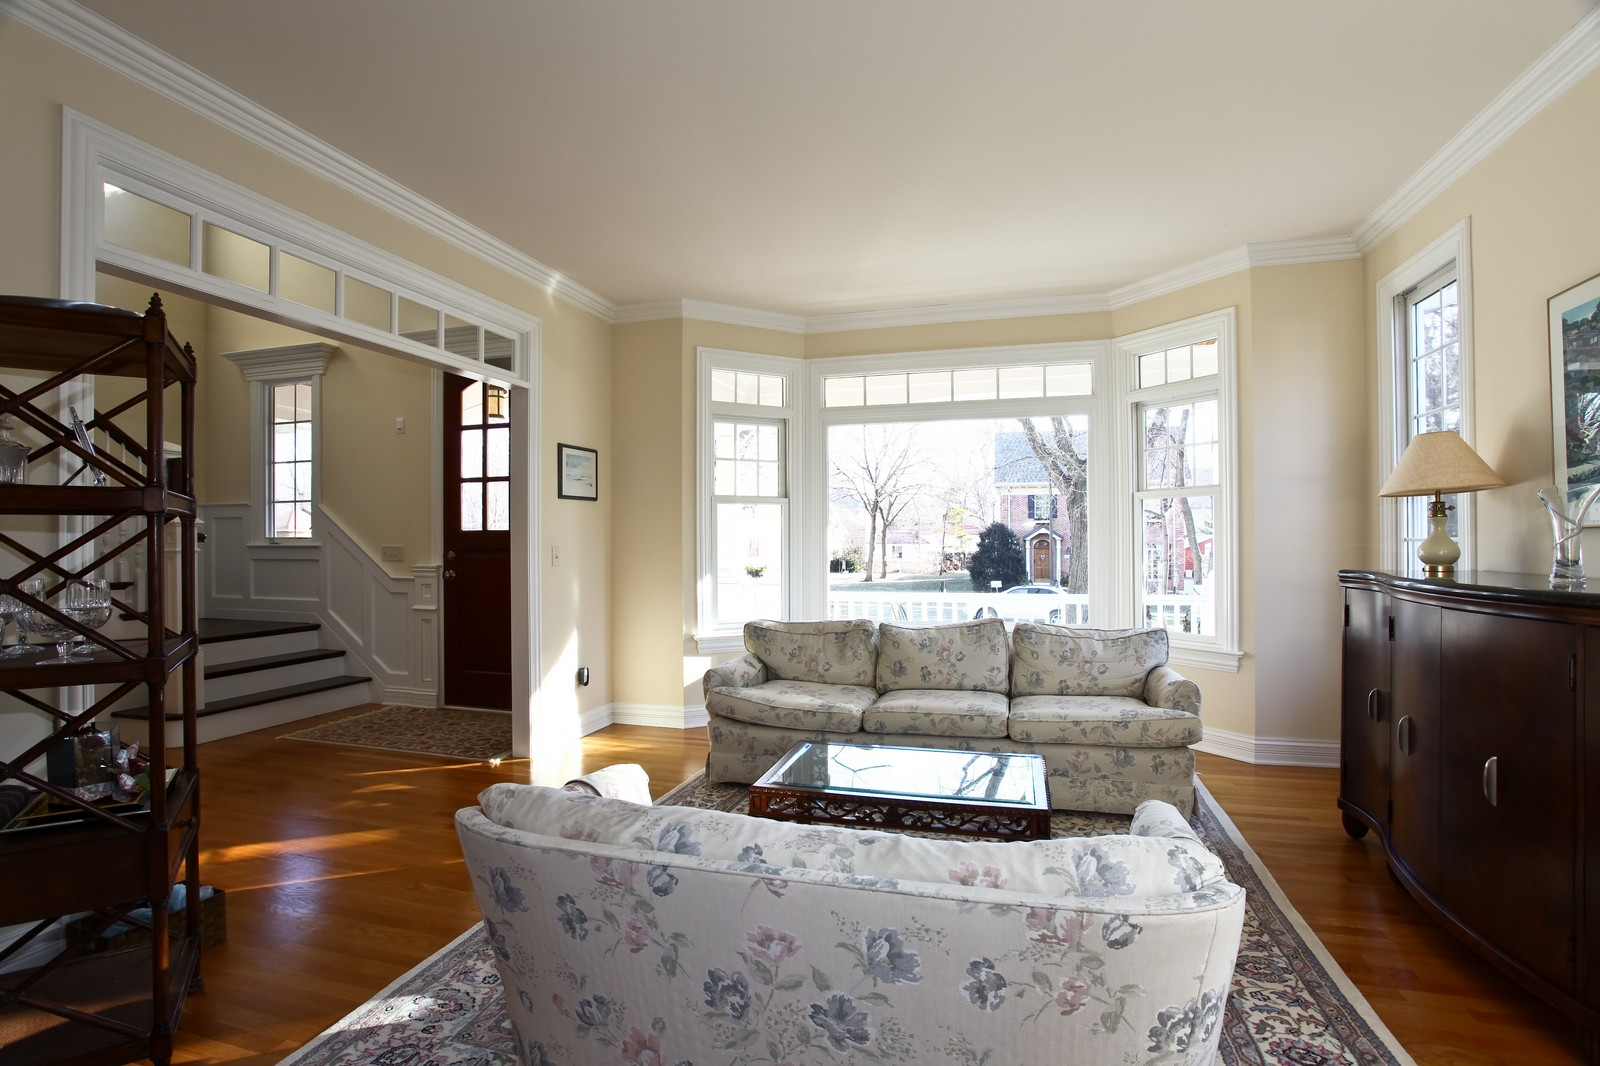 Real Estate Photography - 663 N Webster Street, Naperville, IL, 60563 - Living Room